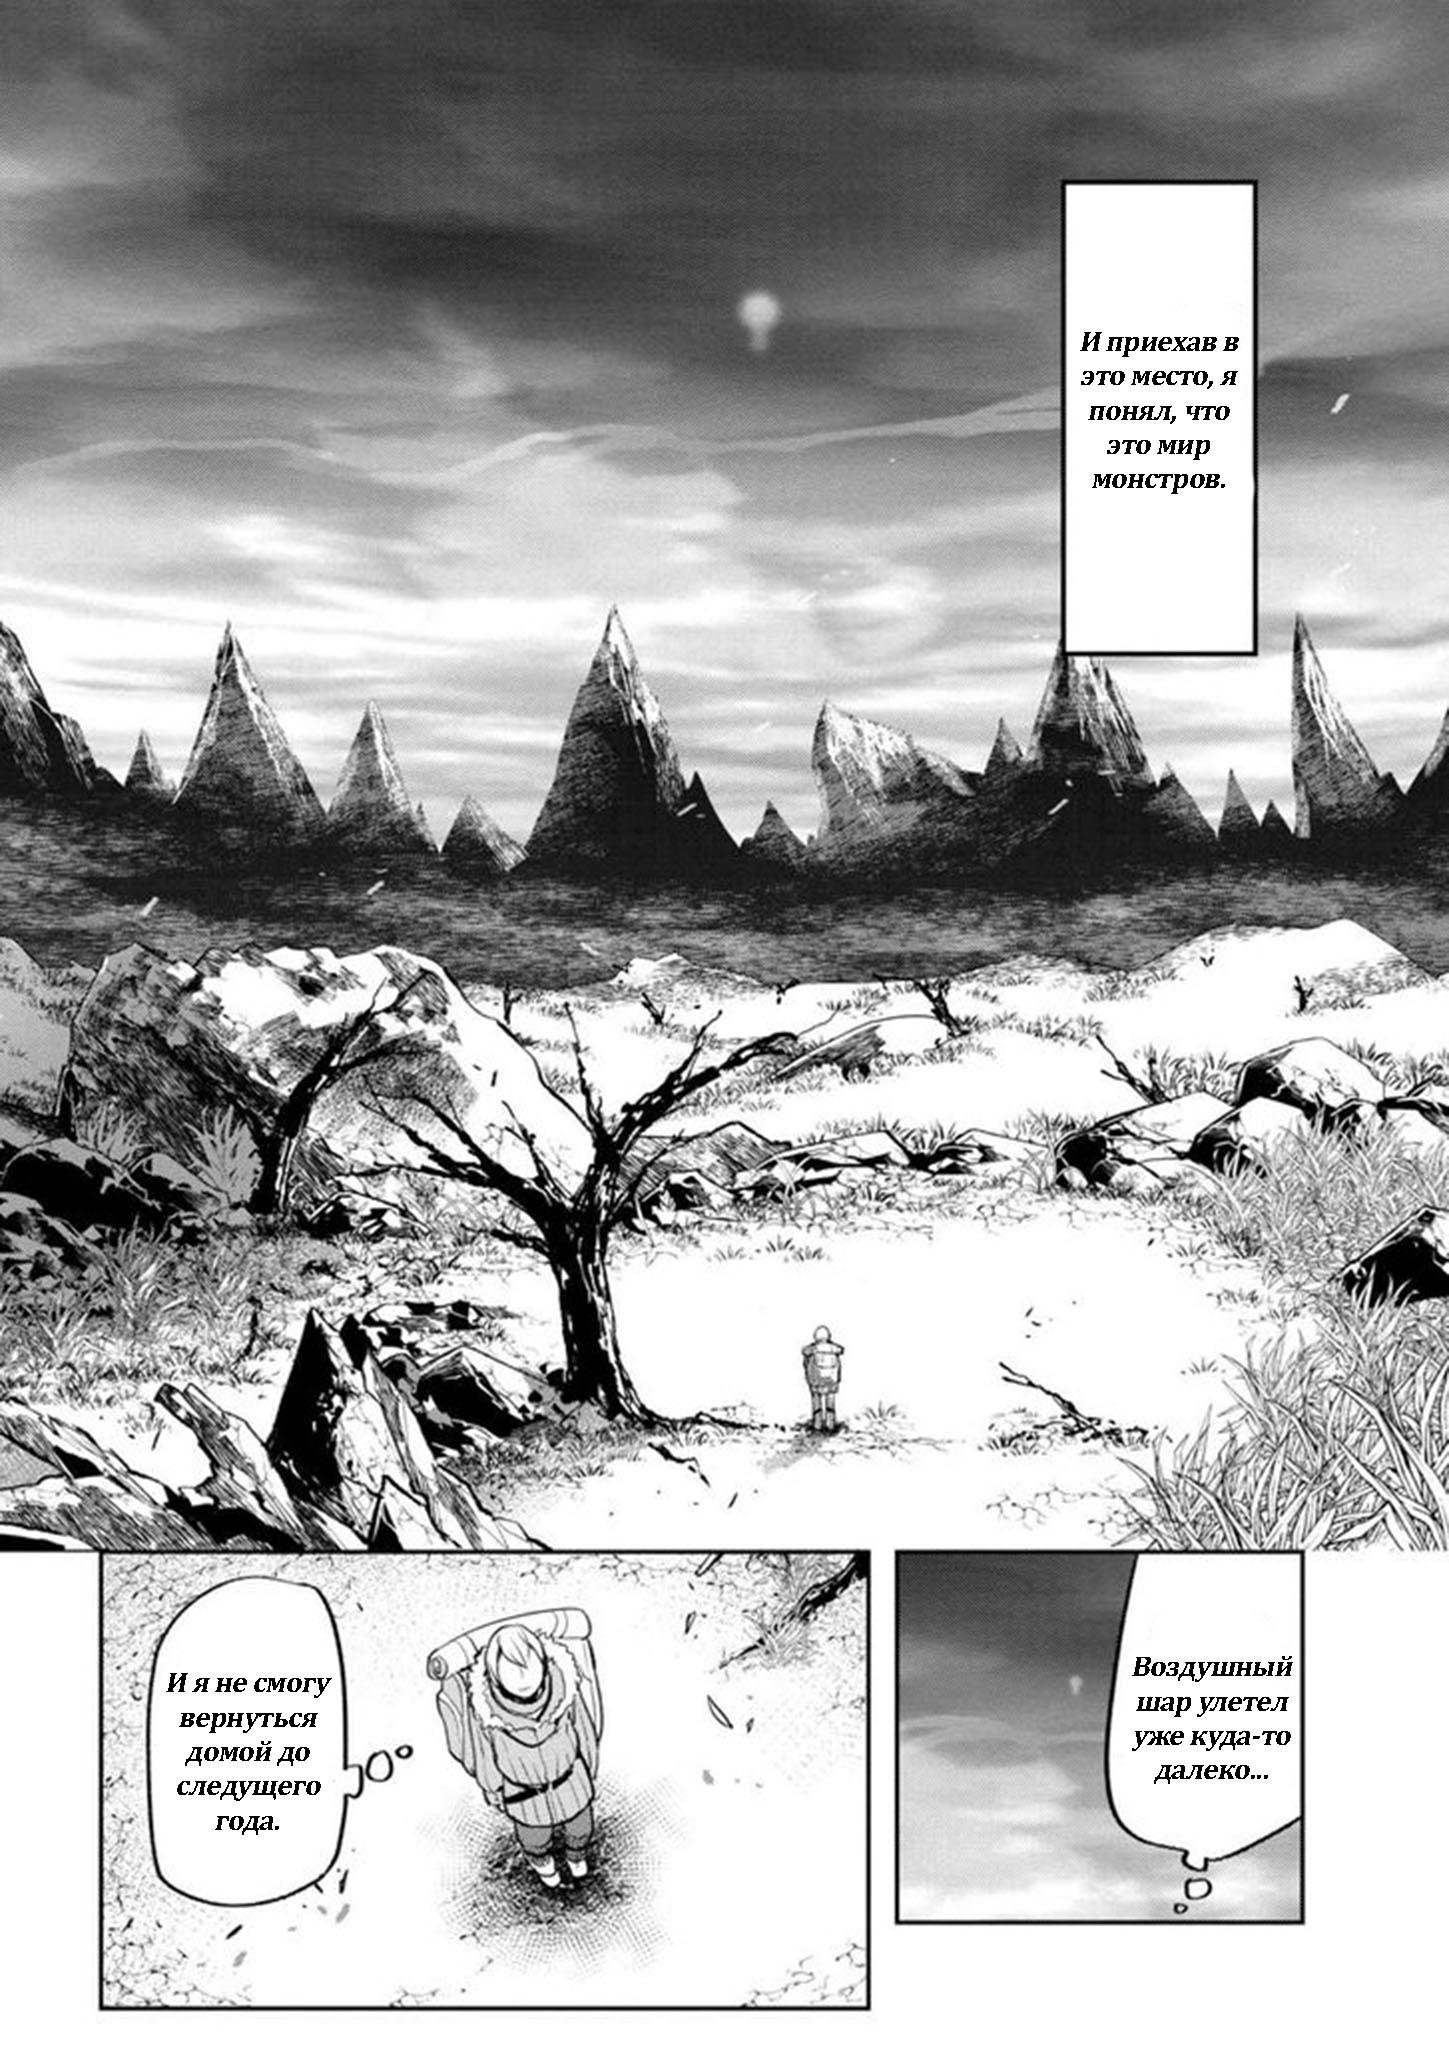 https://r1.ninemanga.com/comics/pic2/5/33797/414526/1529143548241.jpg Page 2